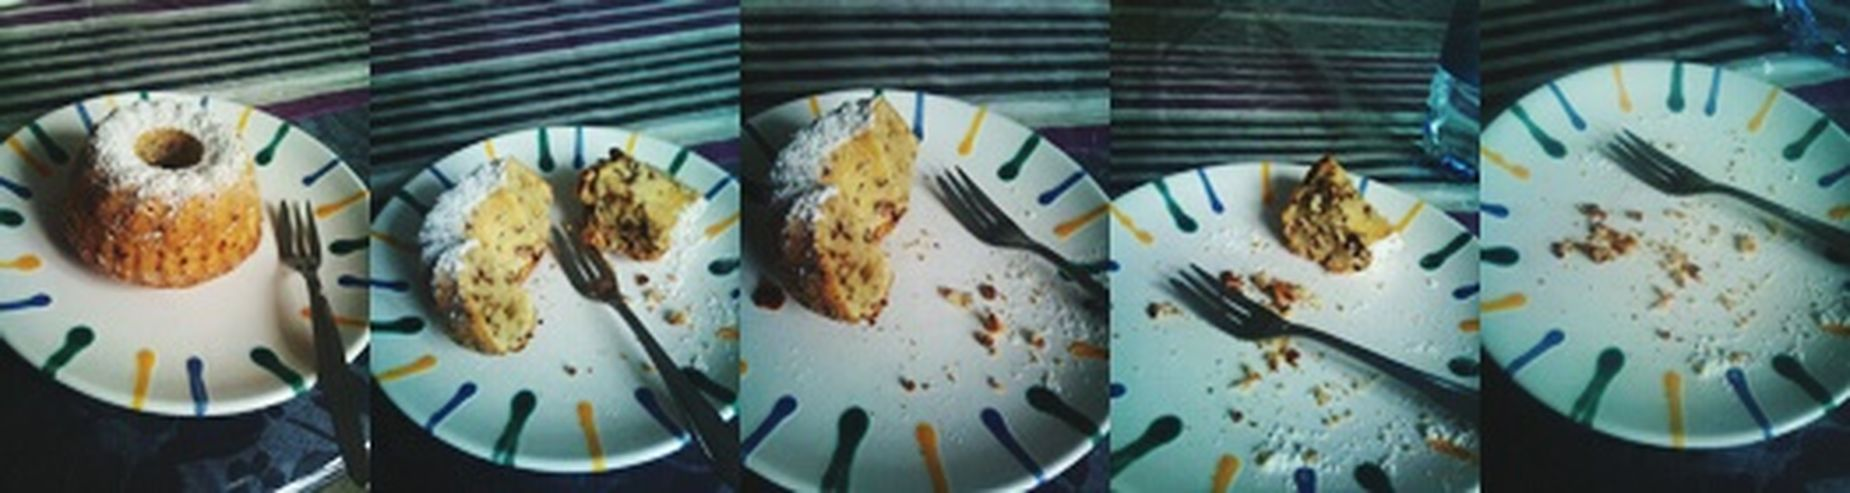 Enjoying Life Cheese! Check This Out Cake Cake Cake Cake Cake